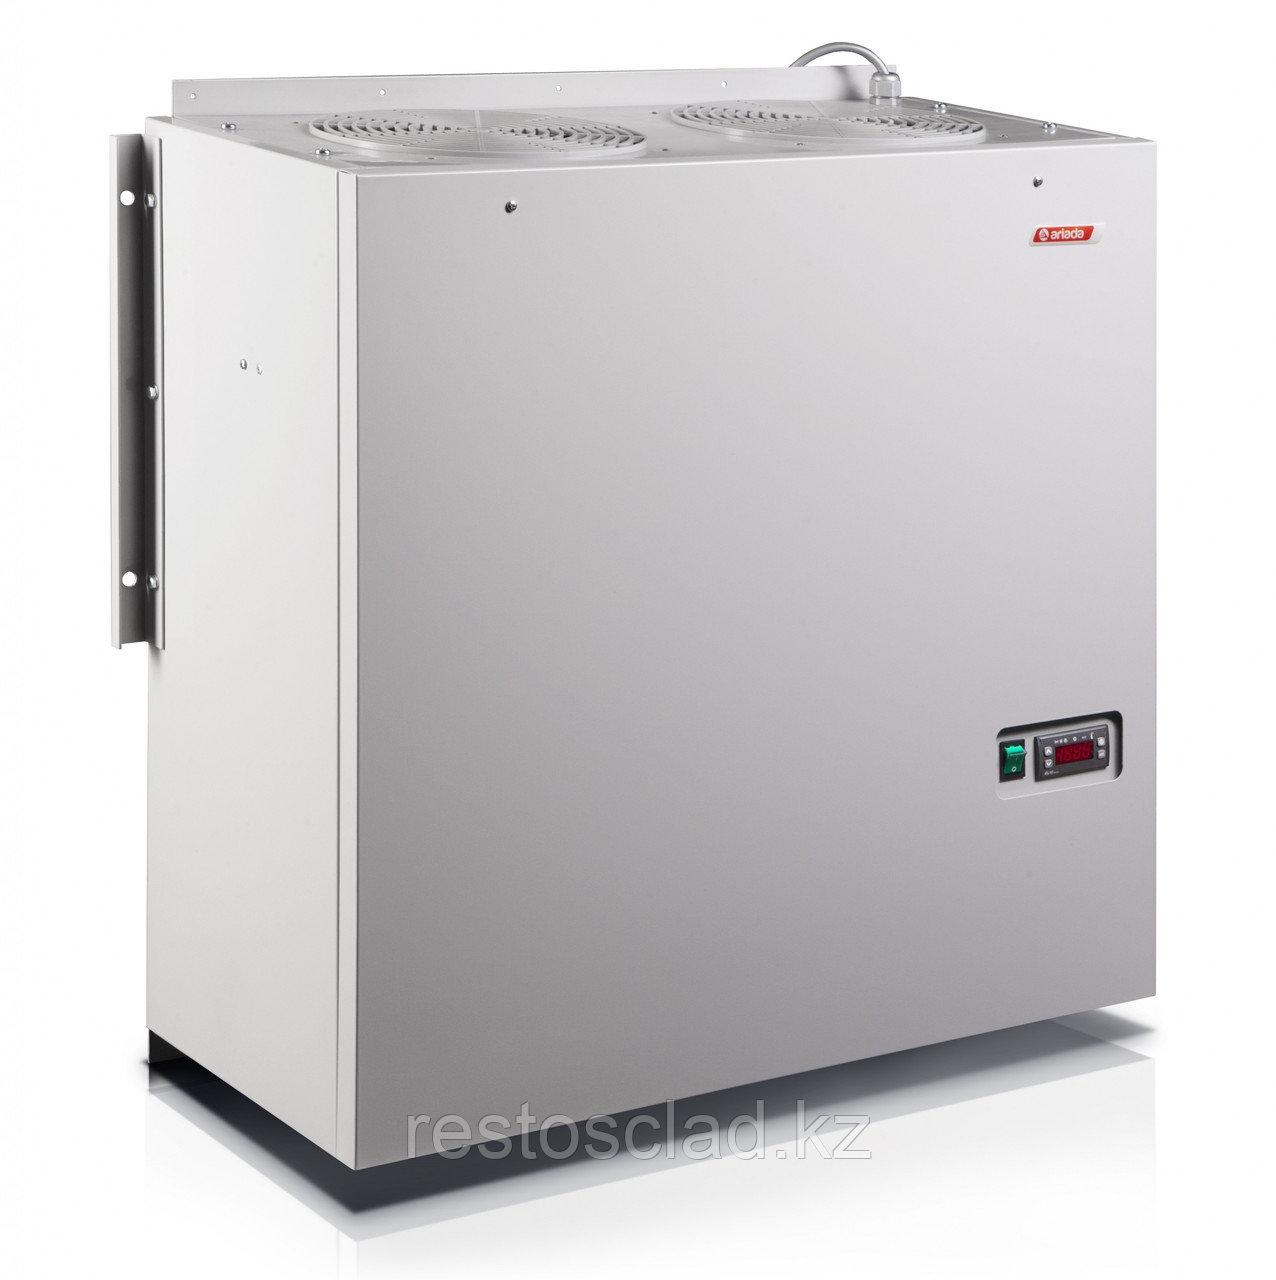 Сплит-система АРИАДА KMS-105